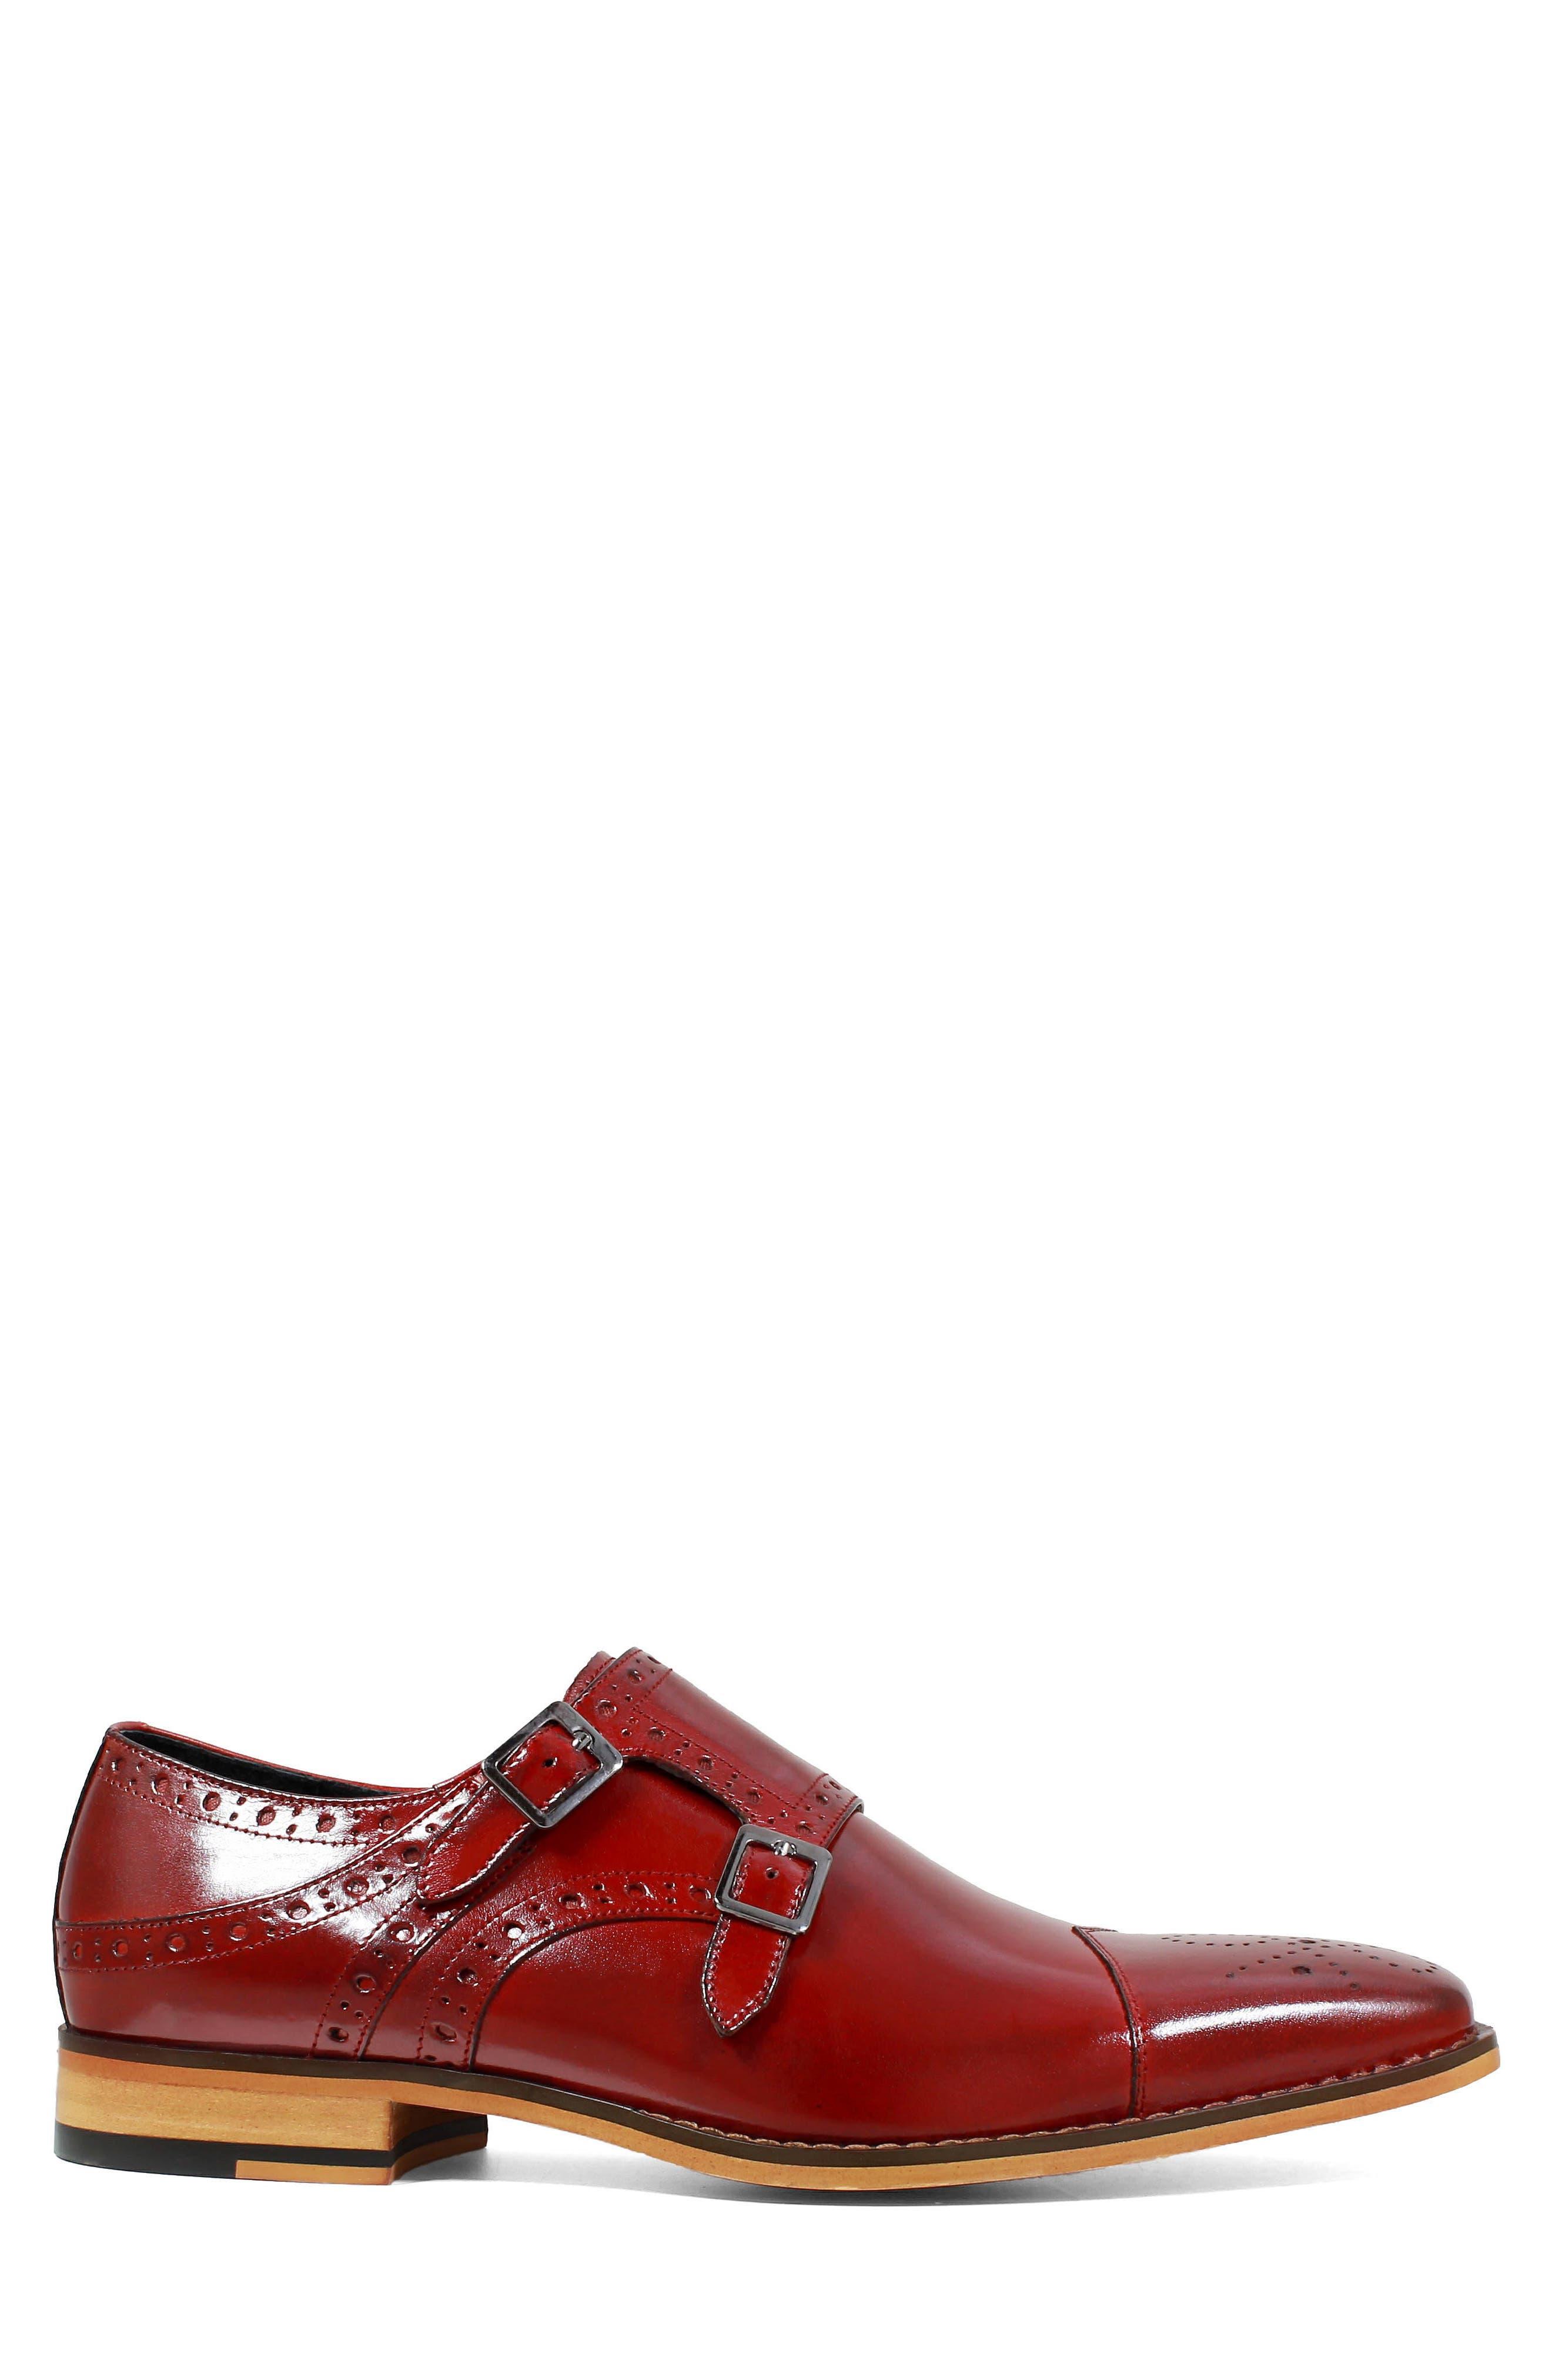 Tayton Cap Toe Double Strap Monk Shoe,                             Alternate thumbnail 3, color,                             RED LEATHER